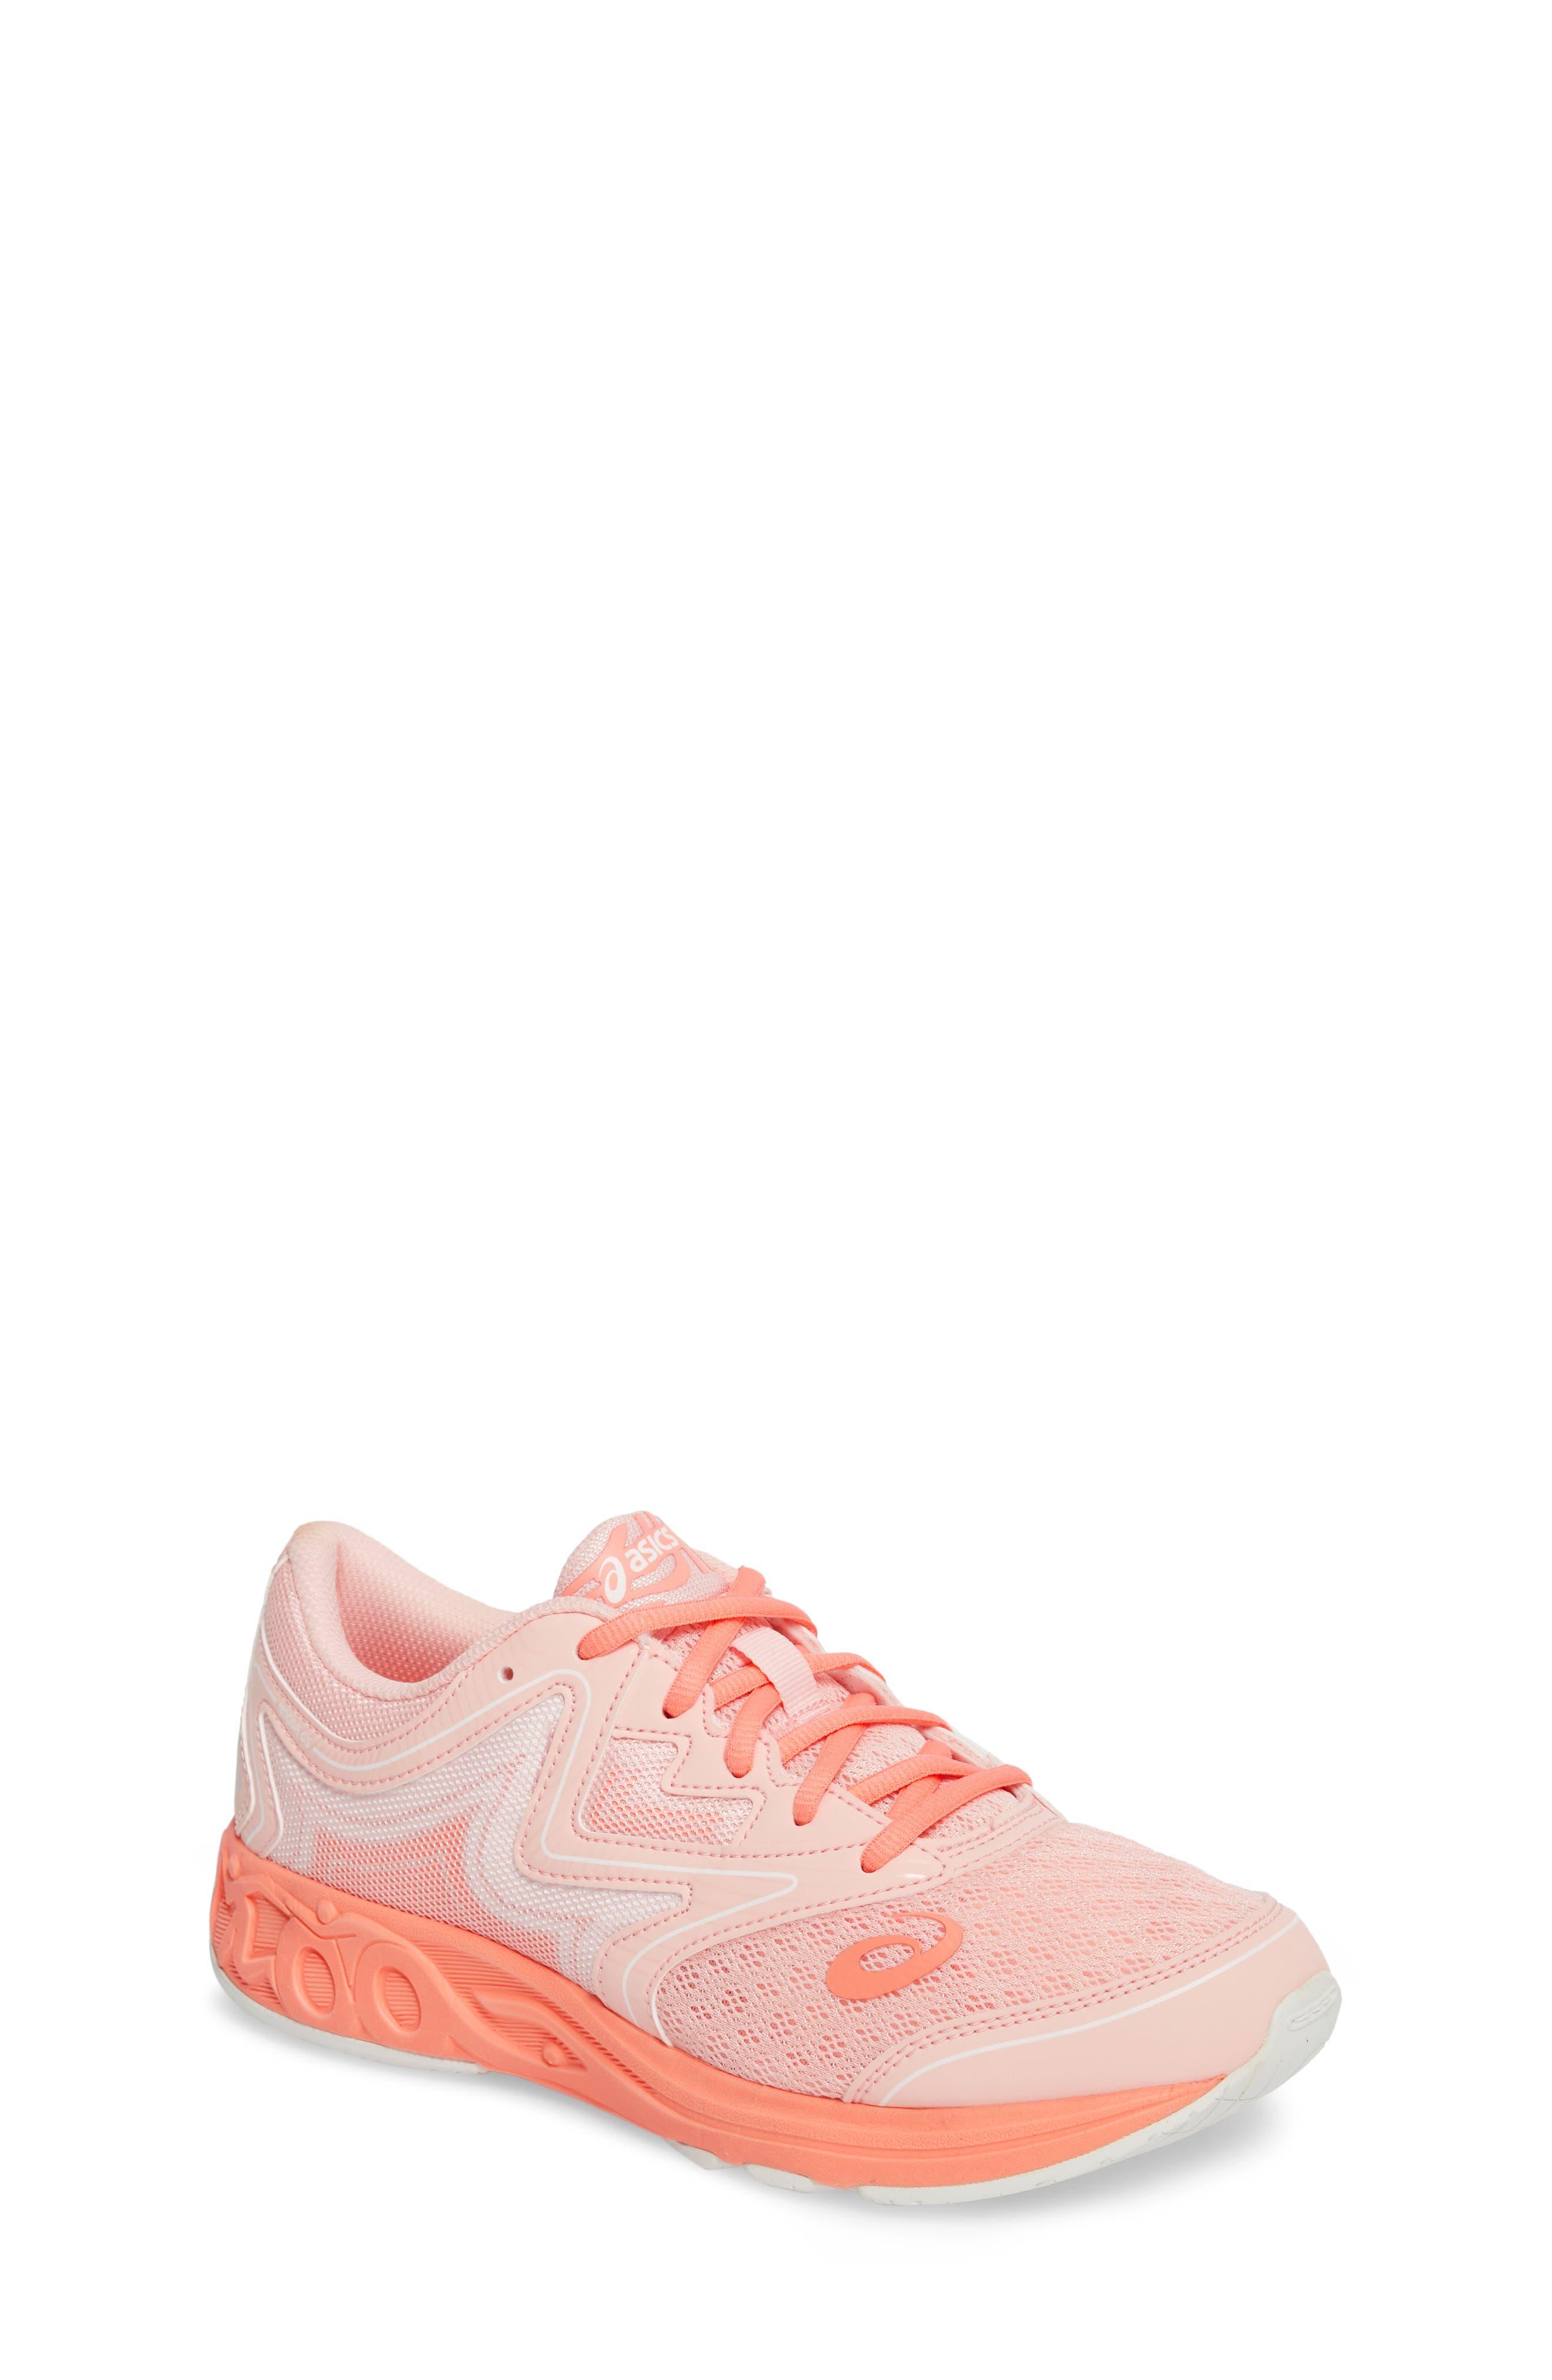 Noosa GS Sneaker,                         Main,                         color, SEASHELL PINK/ BEGONIA/ WHITE